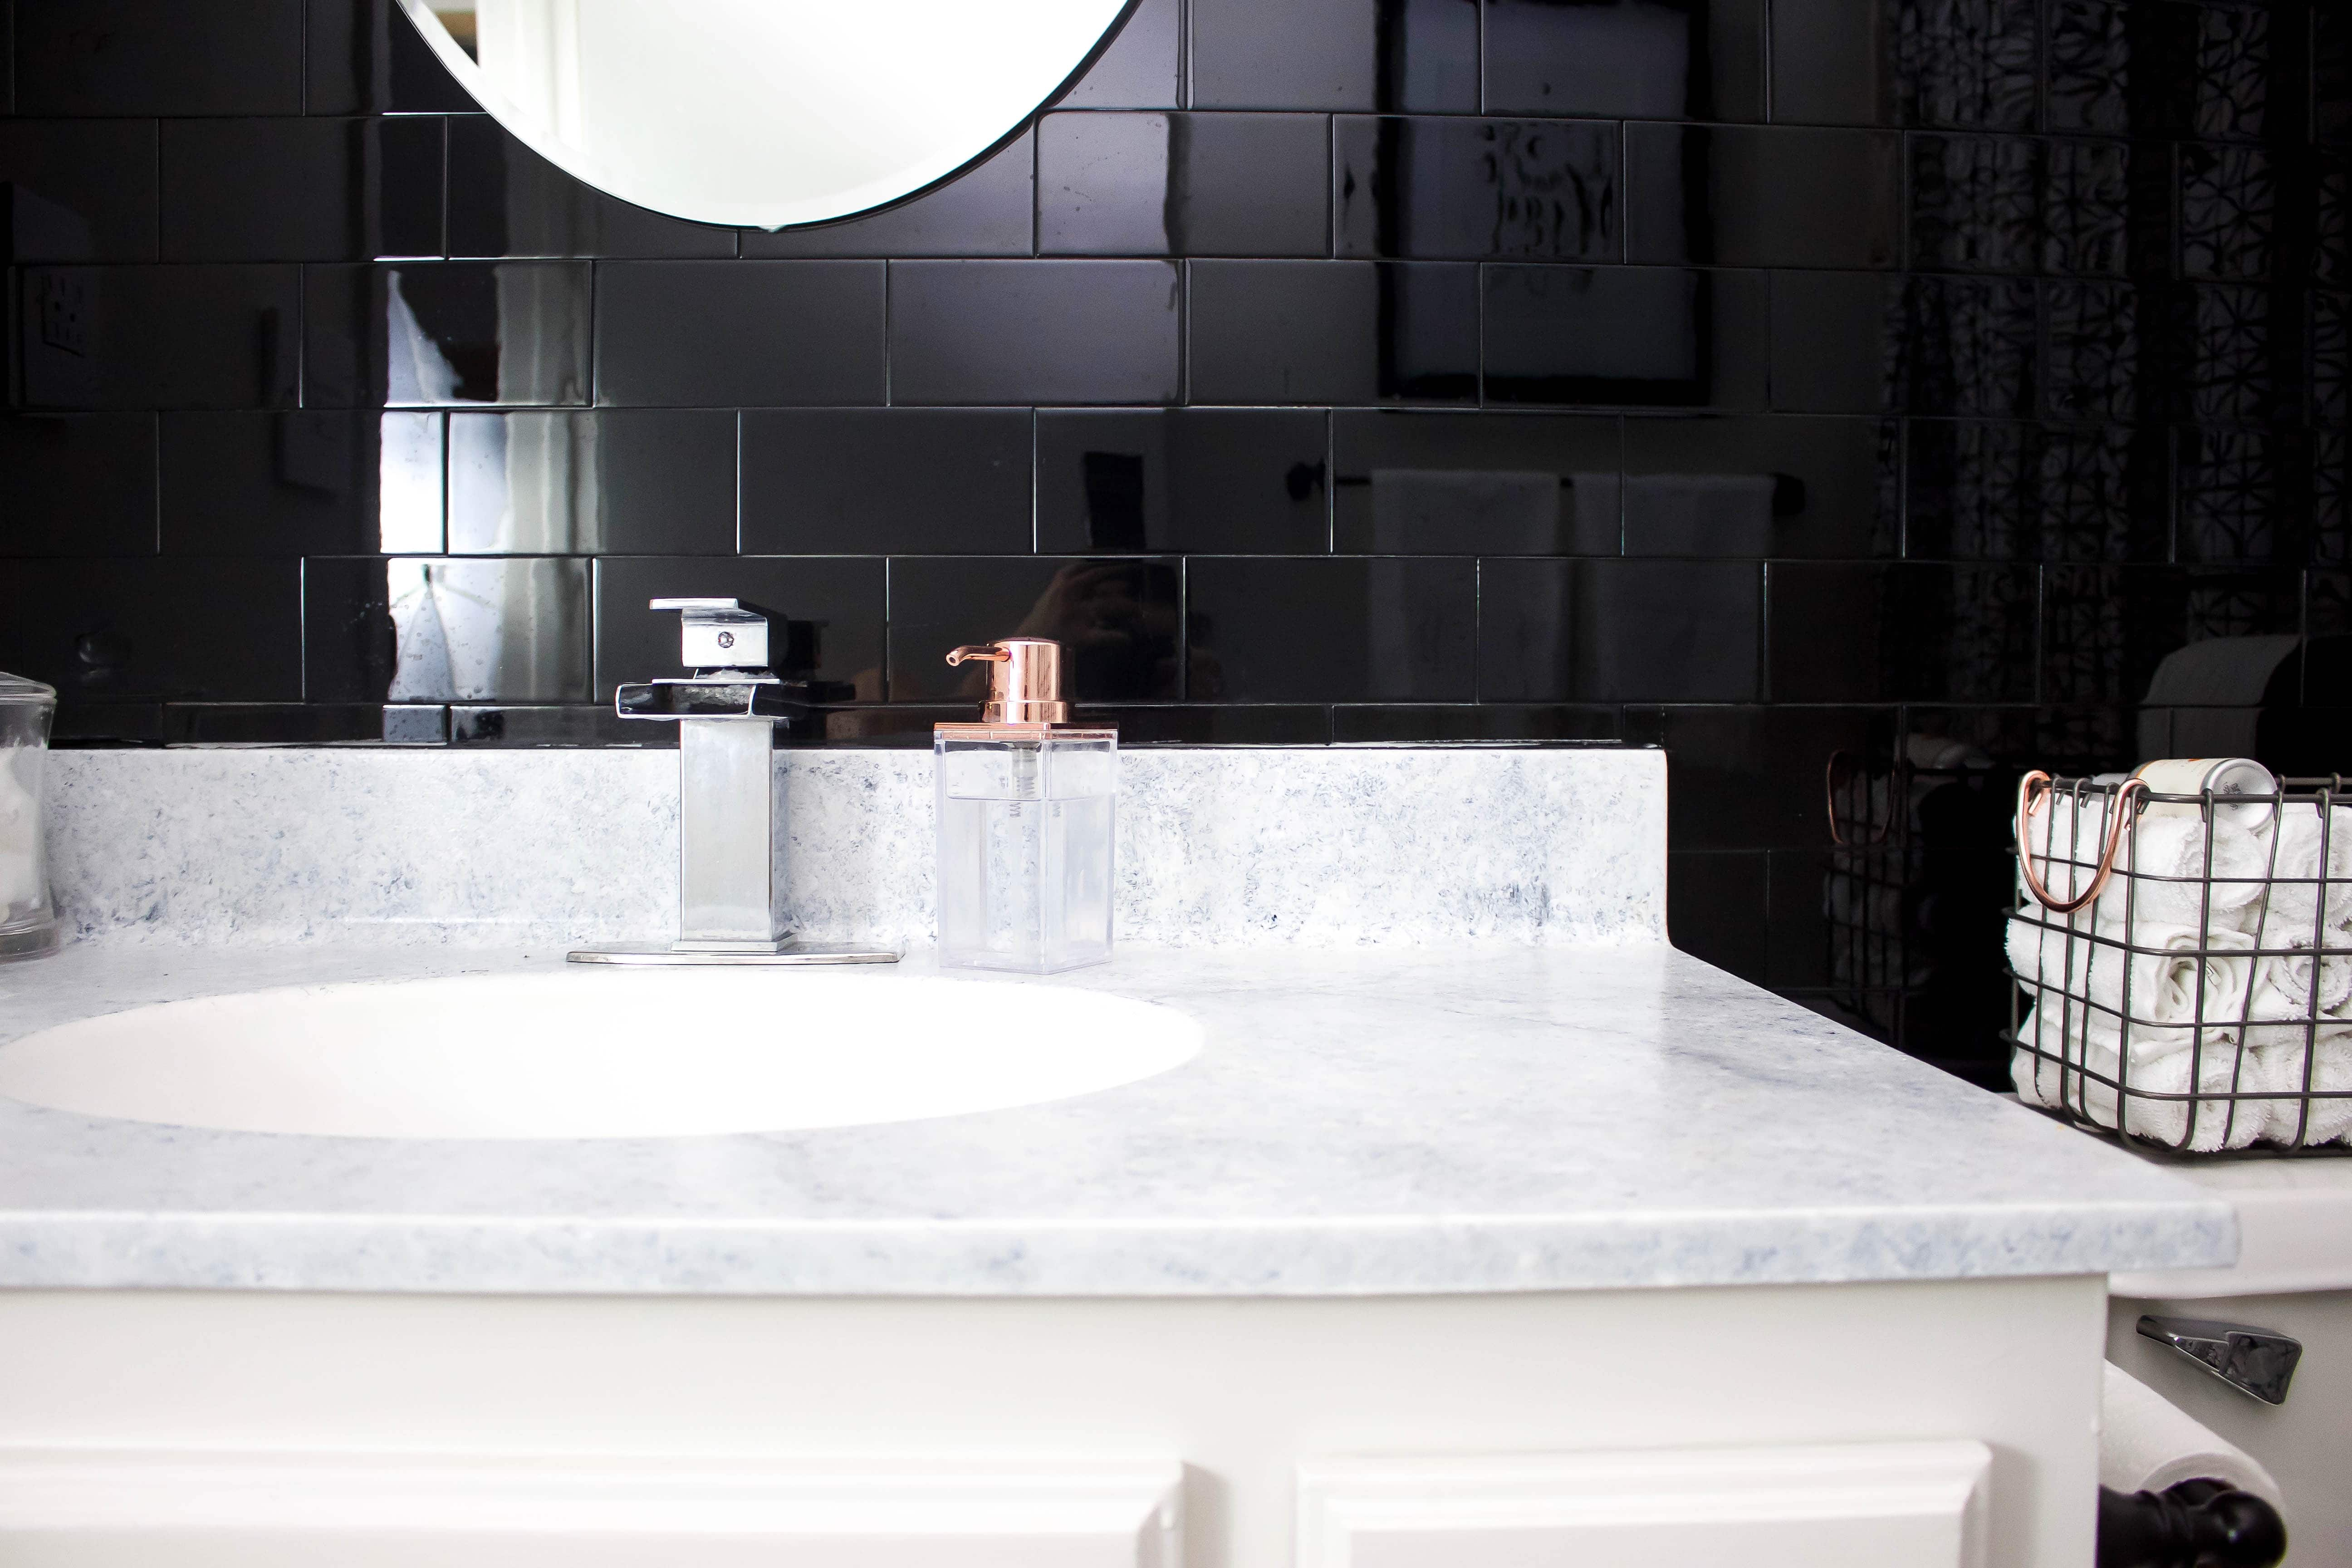 small bathroom makeover wwwrefashionablylatecom - Small Bathroom Makeover